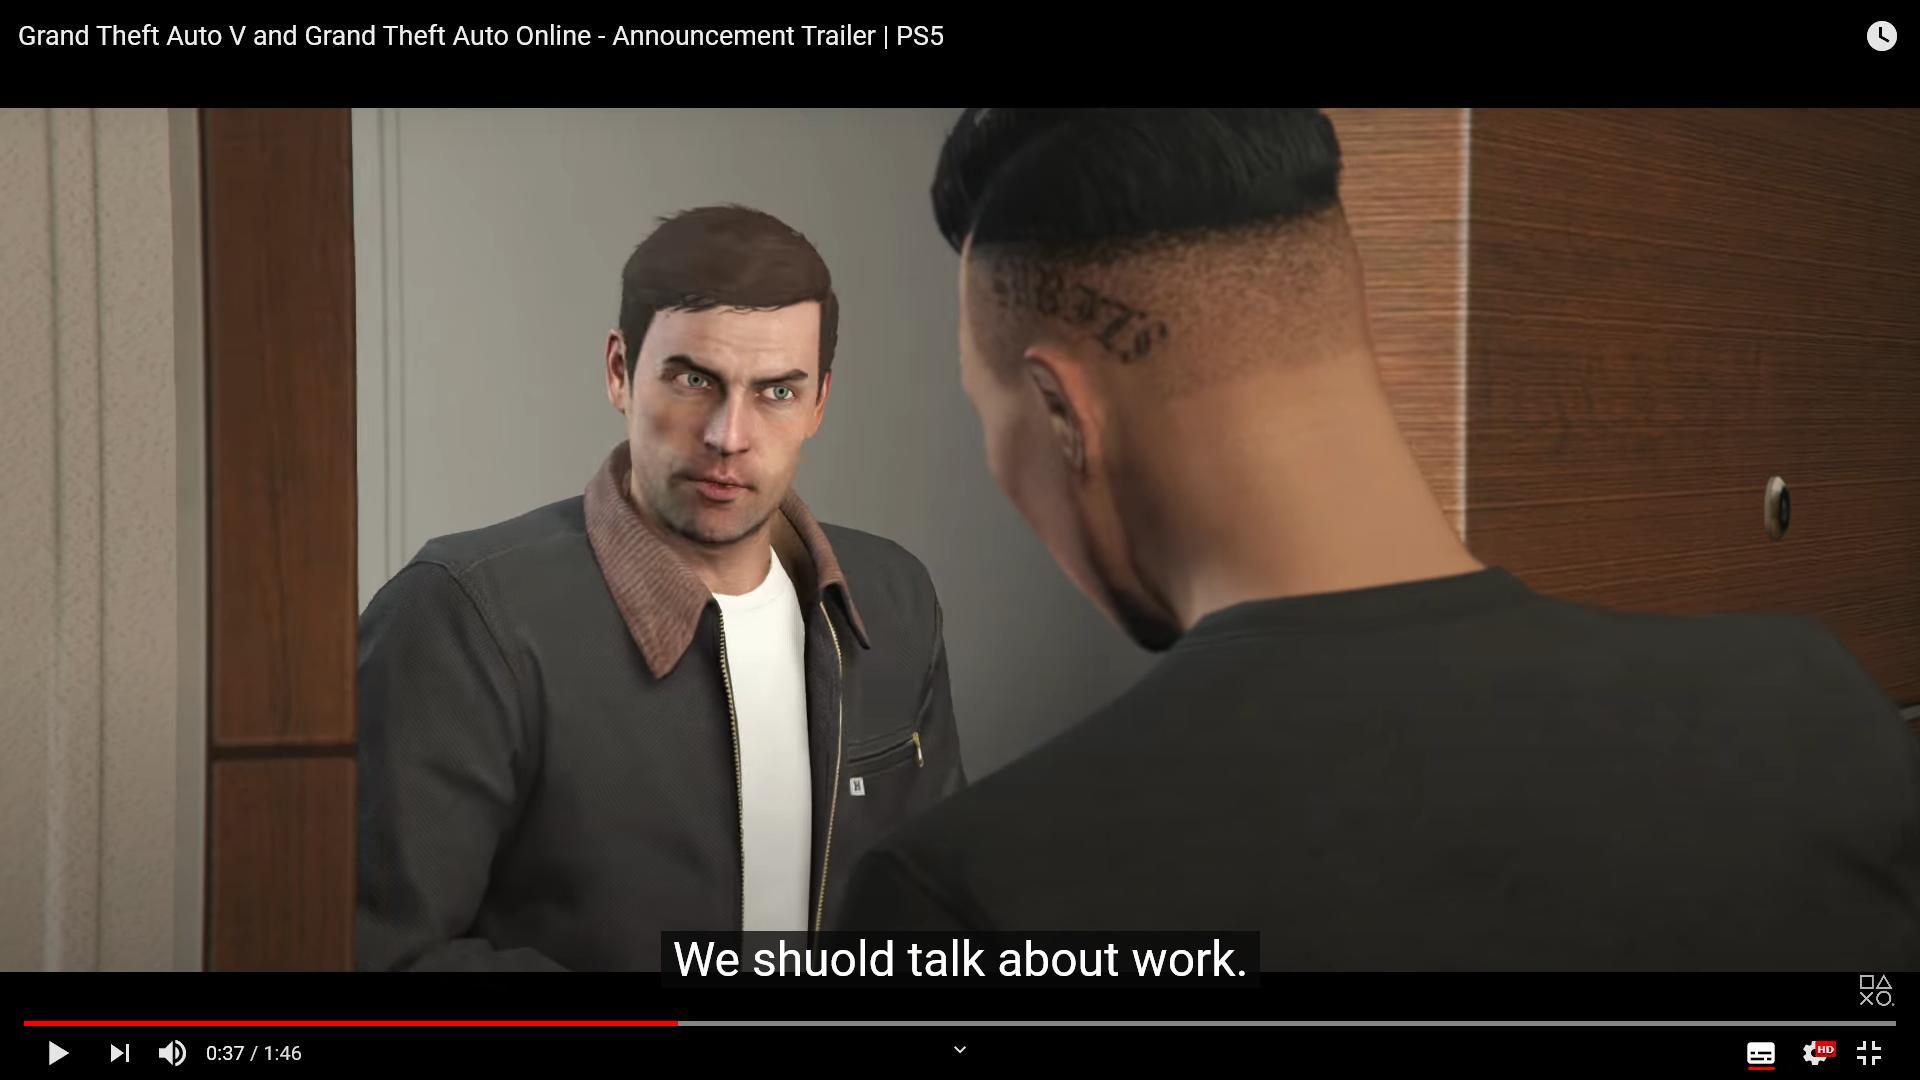 UUnS3Wm - 【悲報】PS5版GTA5のグラフィックが残念すぎると話題にwwww